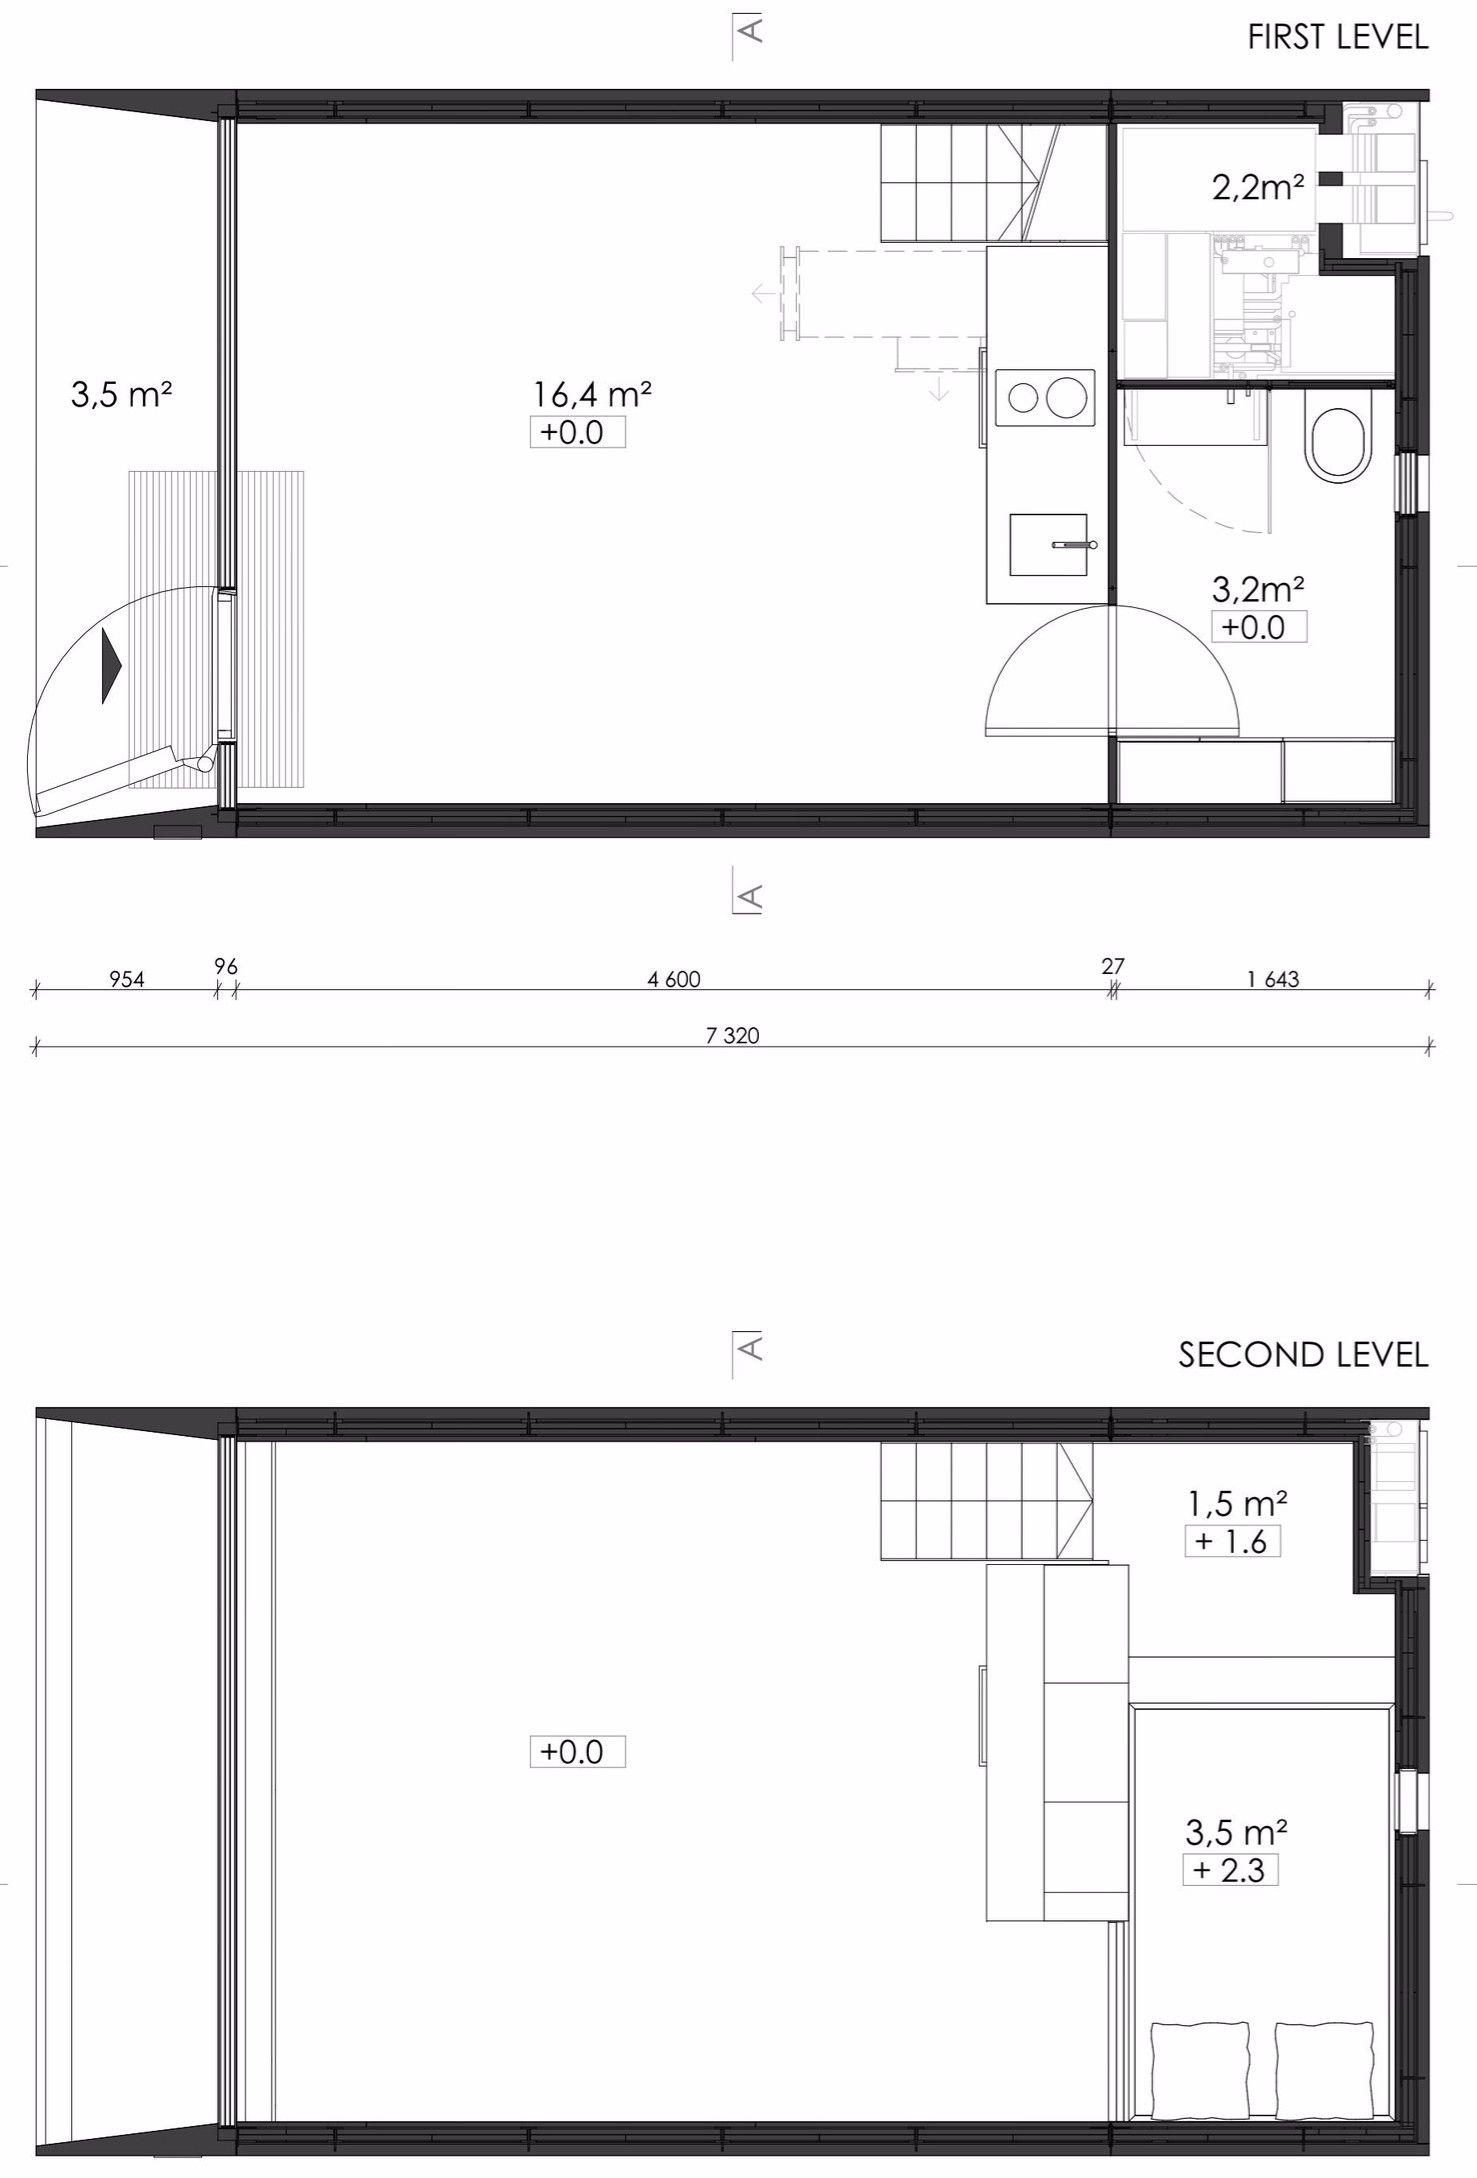 KODA - Kodasema - Estonia - Floor Plans - Humble Homes | Tiny ...